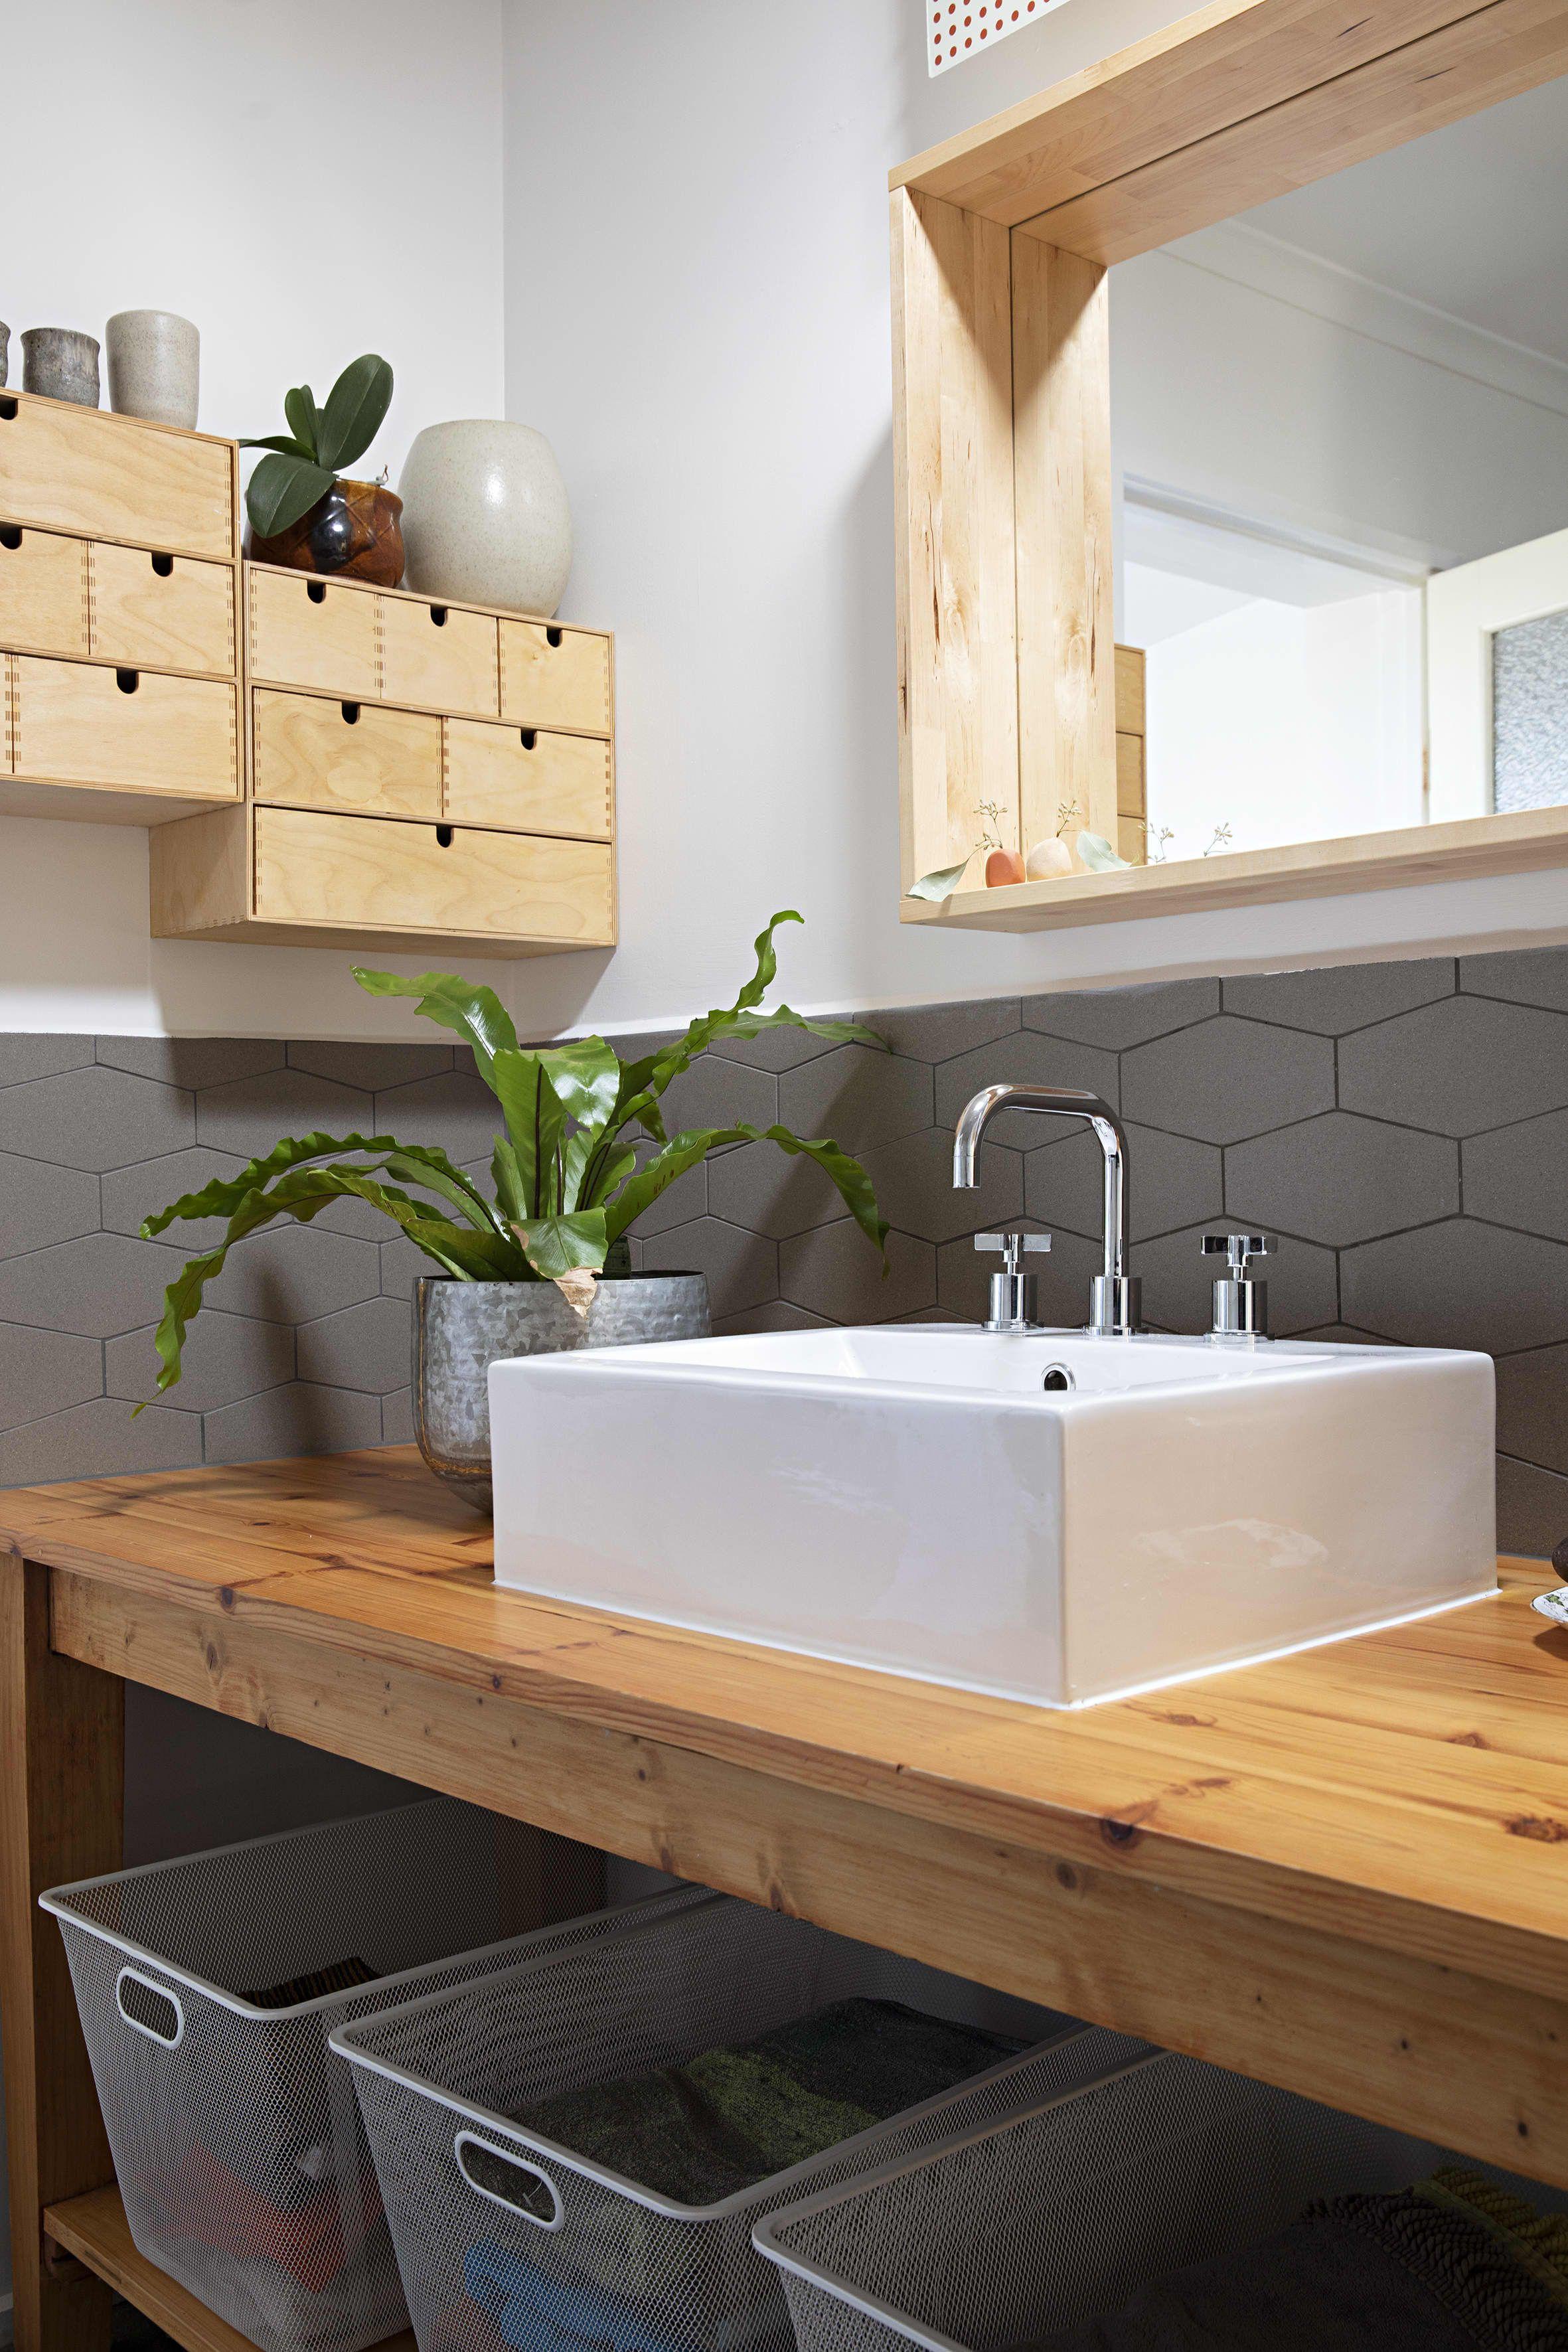 An Australian Country Home Has Beautiful BuiltIns